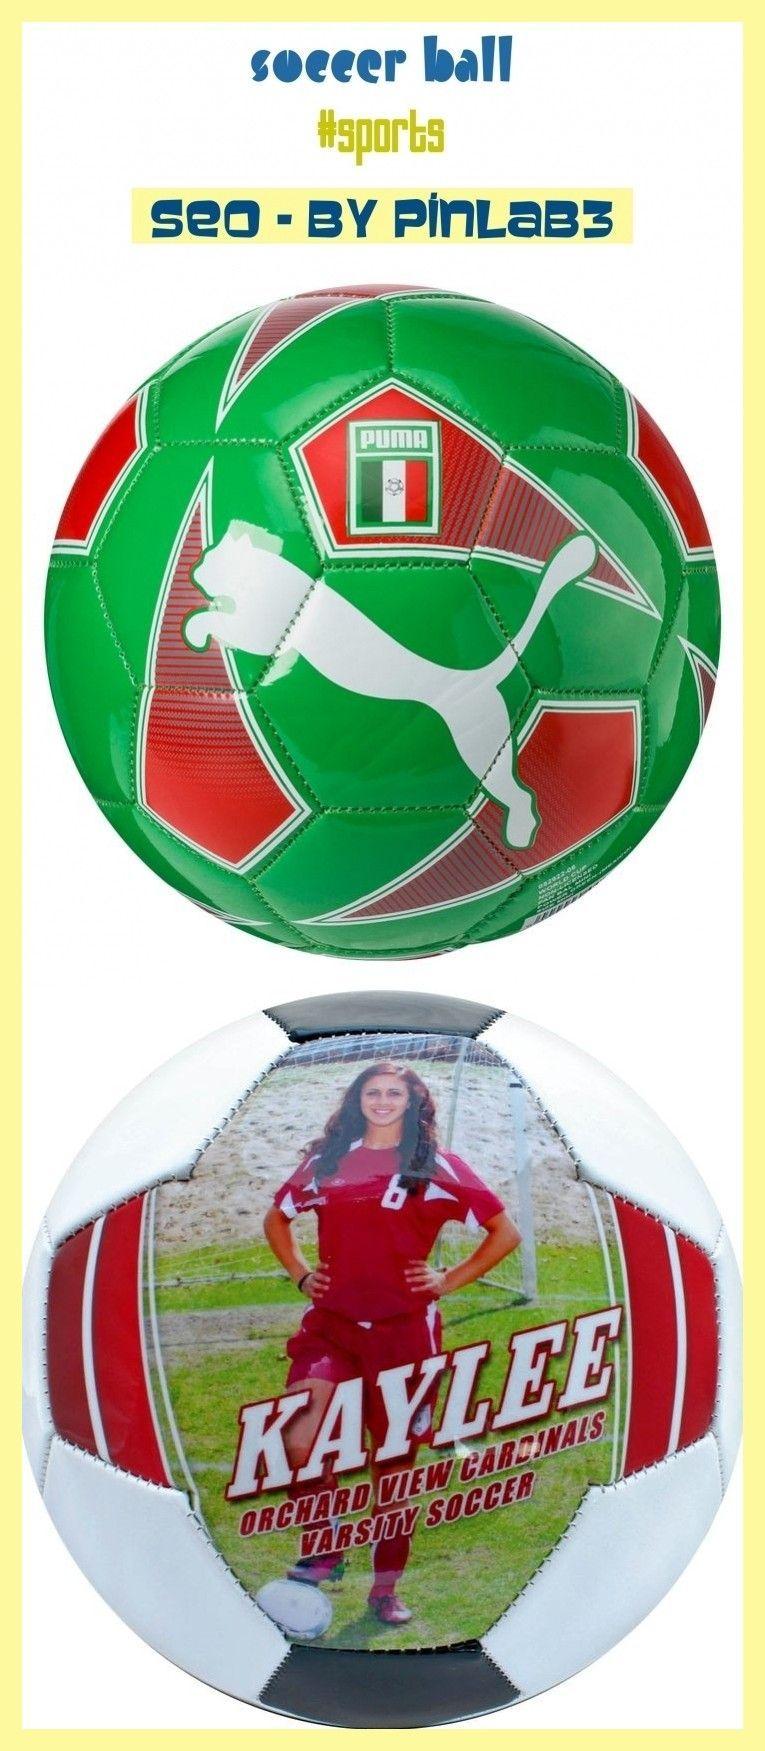 Soccer Ball Soccer Fussball Ballon Football Fussball Ballon De Football Soccer Girl Outfits Mia Blog In 2020 Soccer Ball Soccer Gaming Clothes